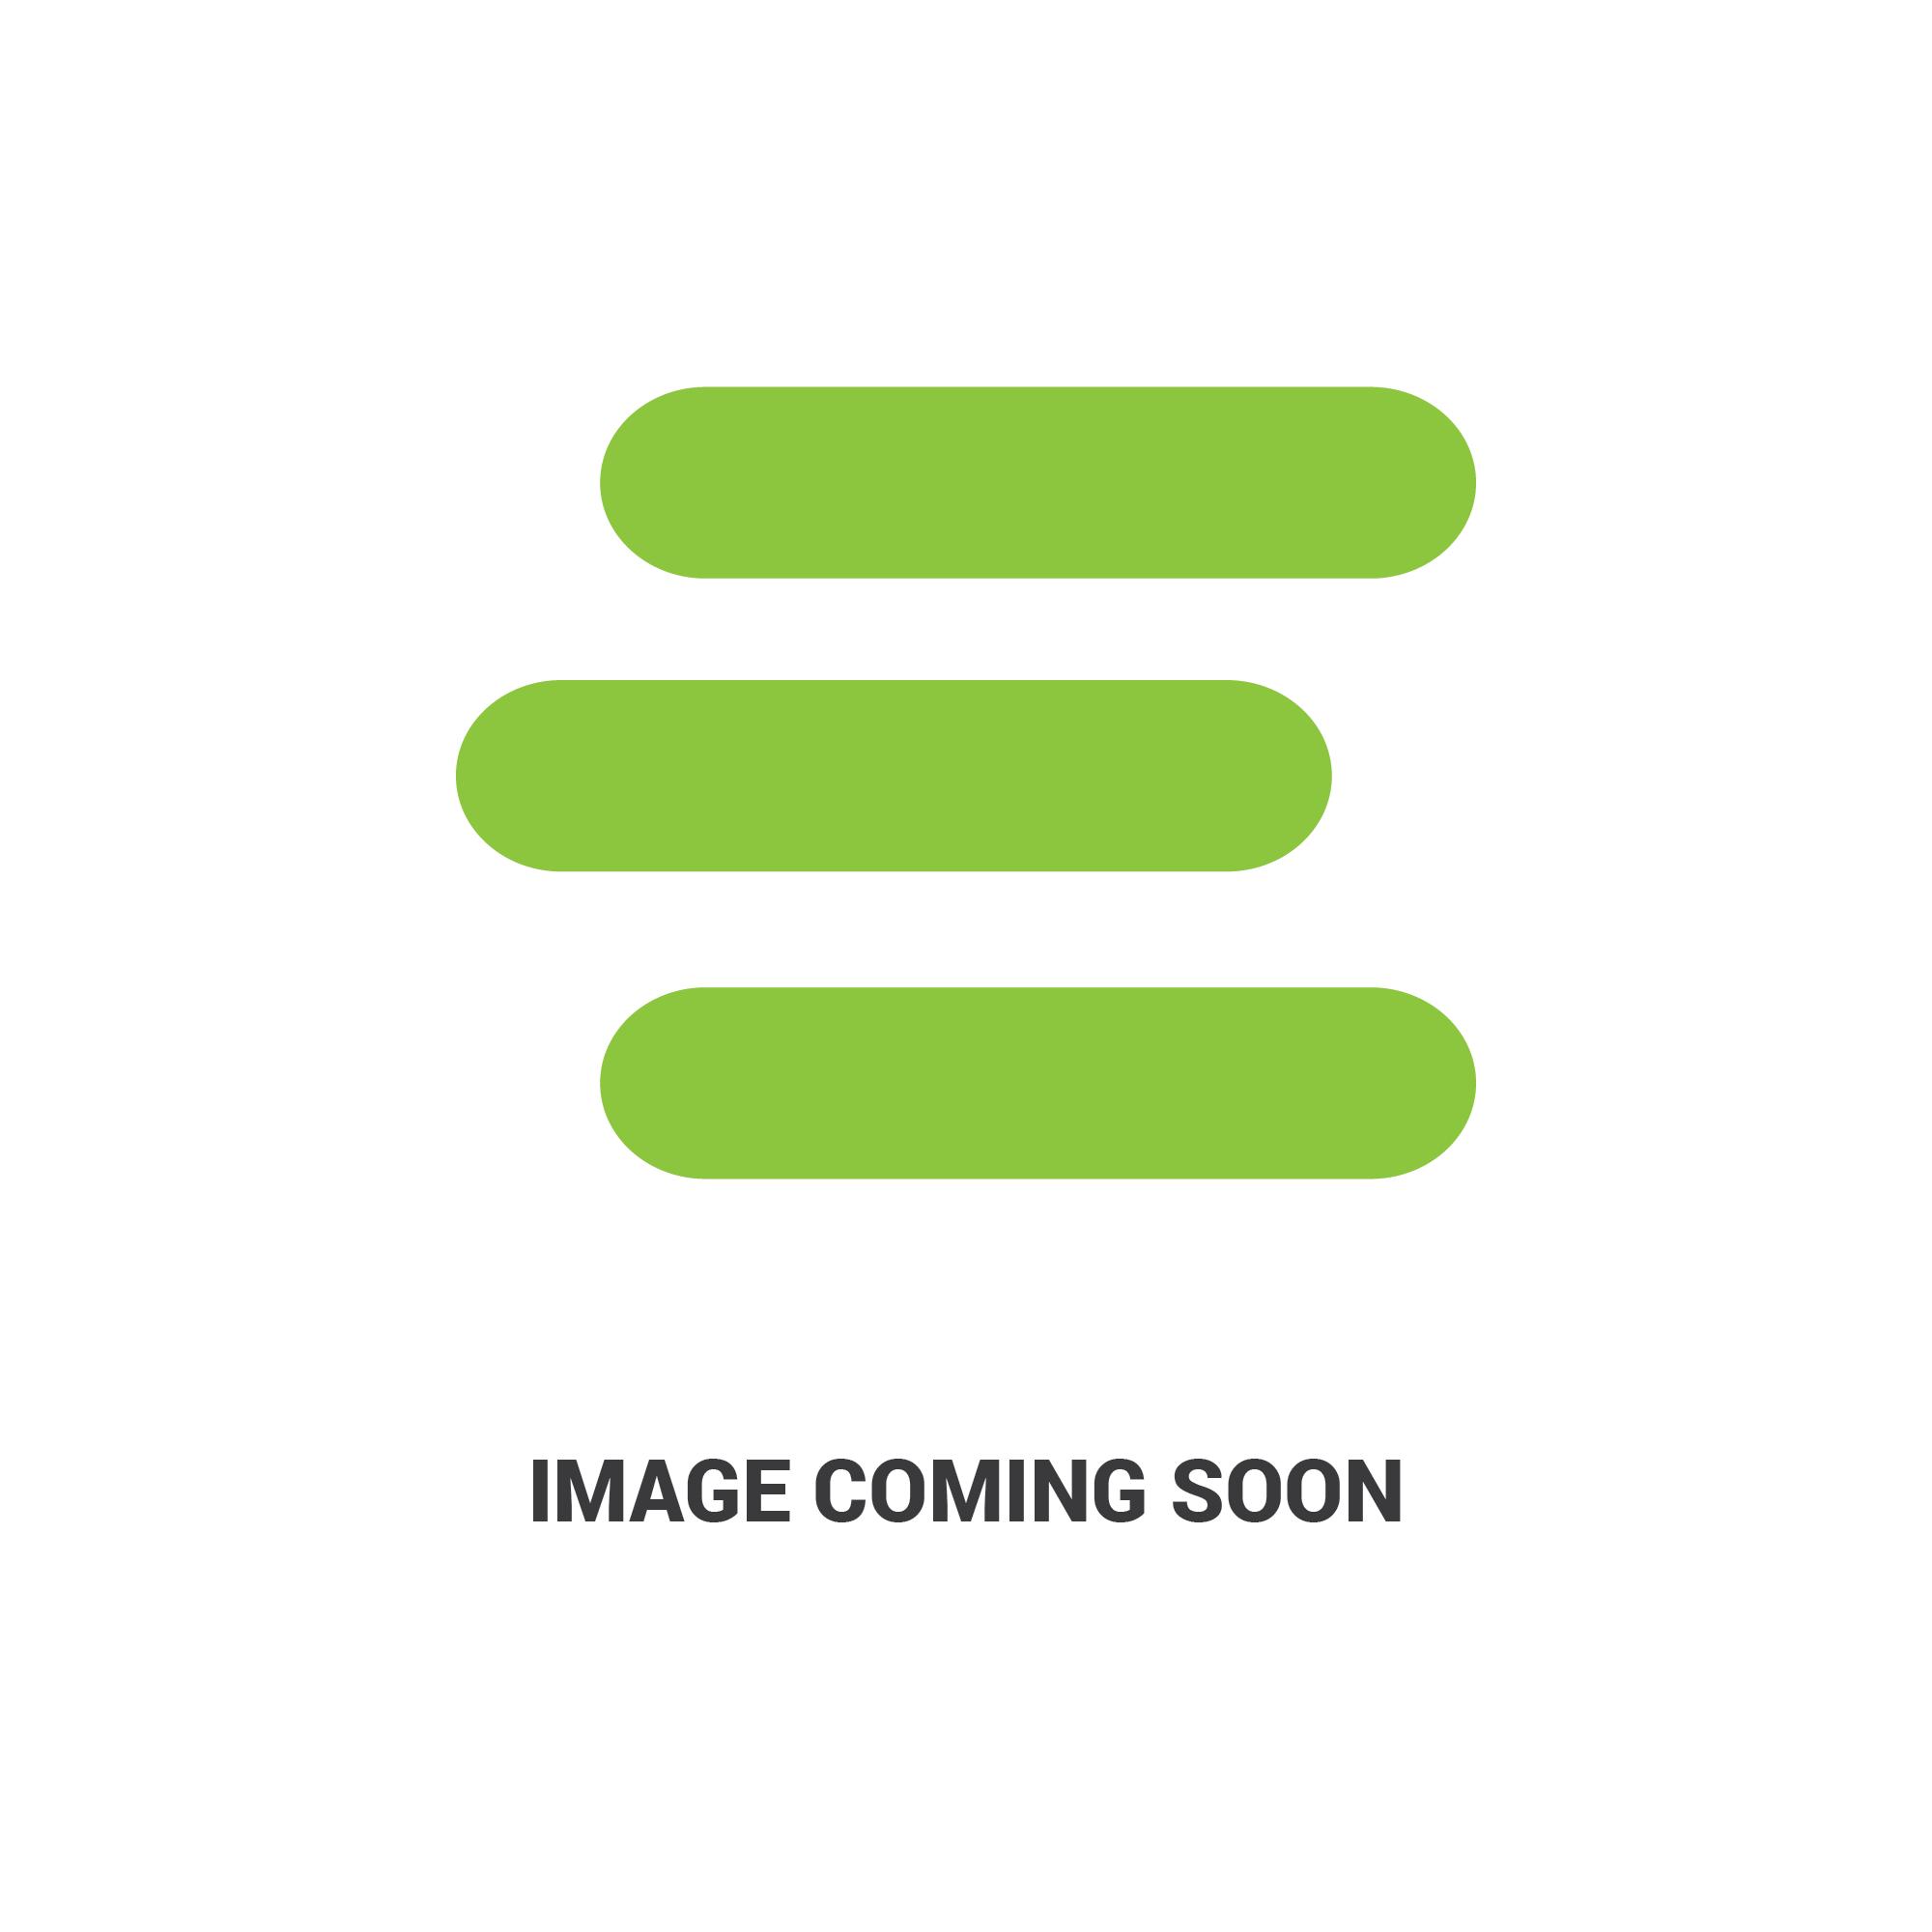 E-15241-320921968_1.jpg